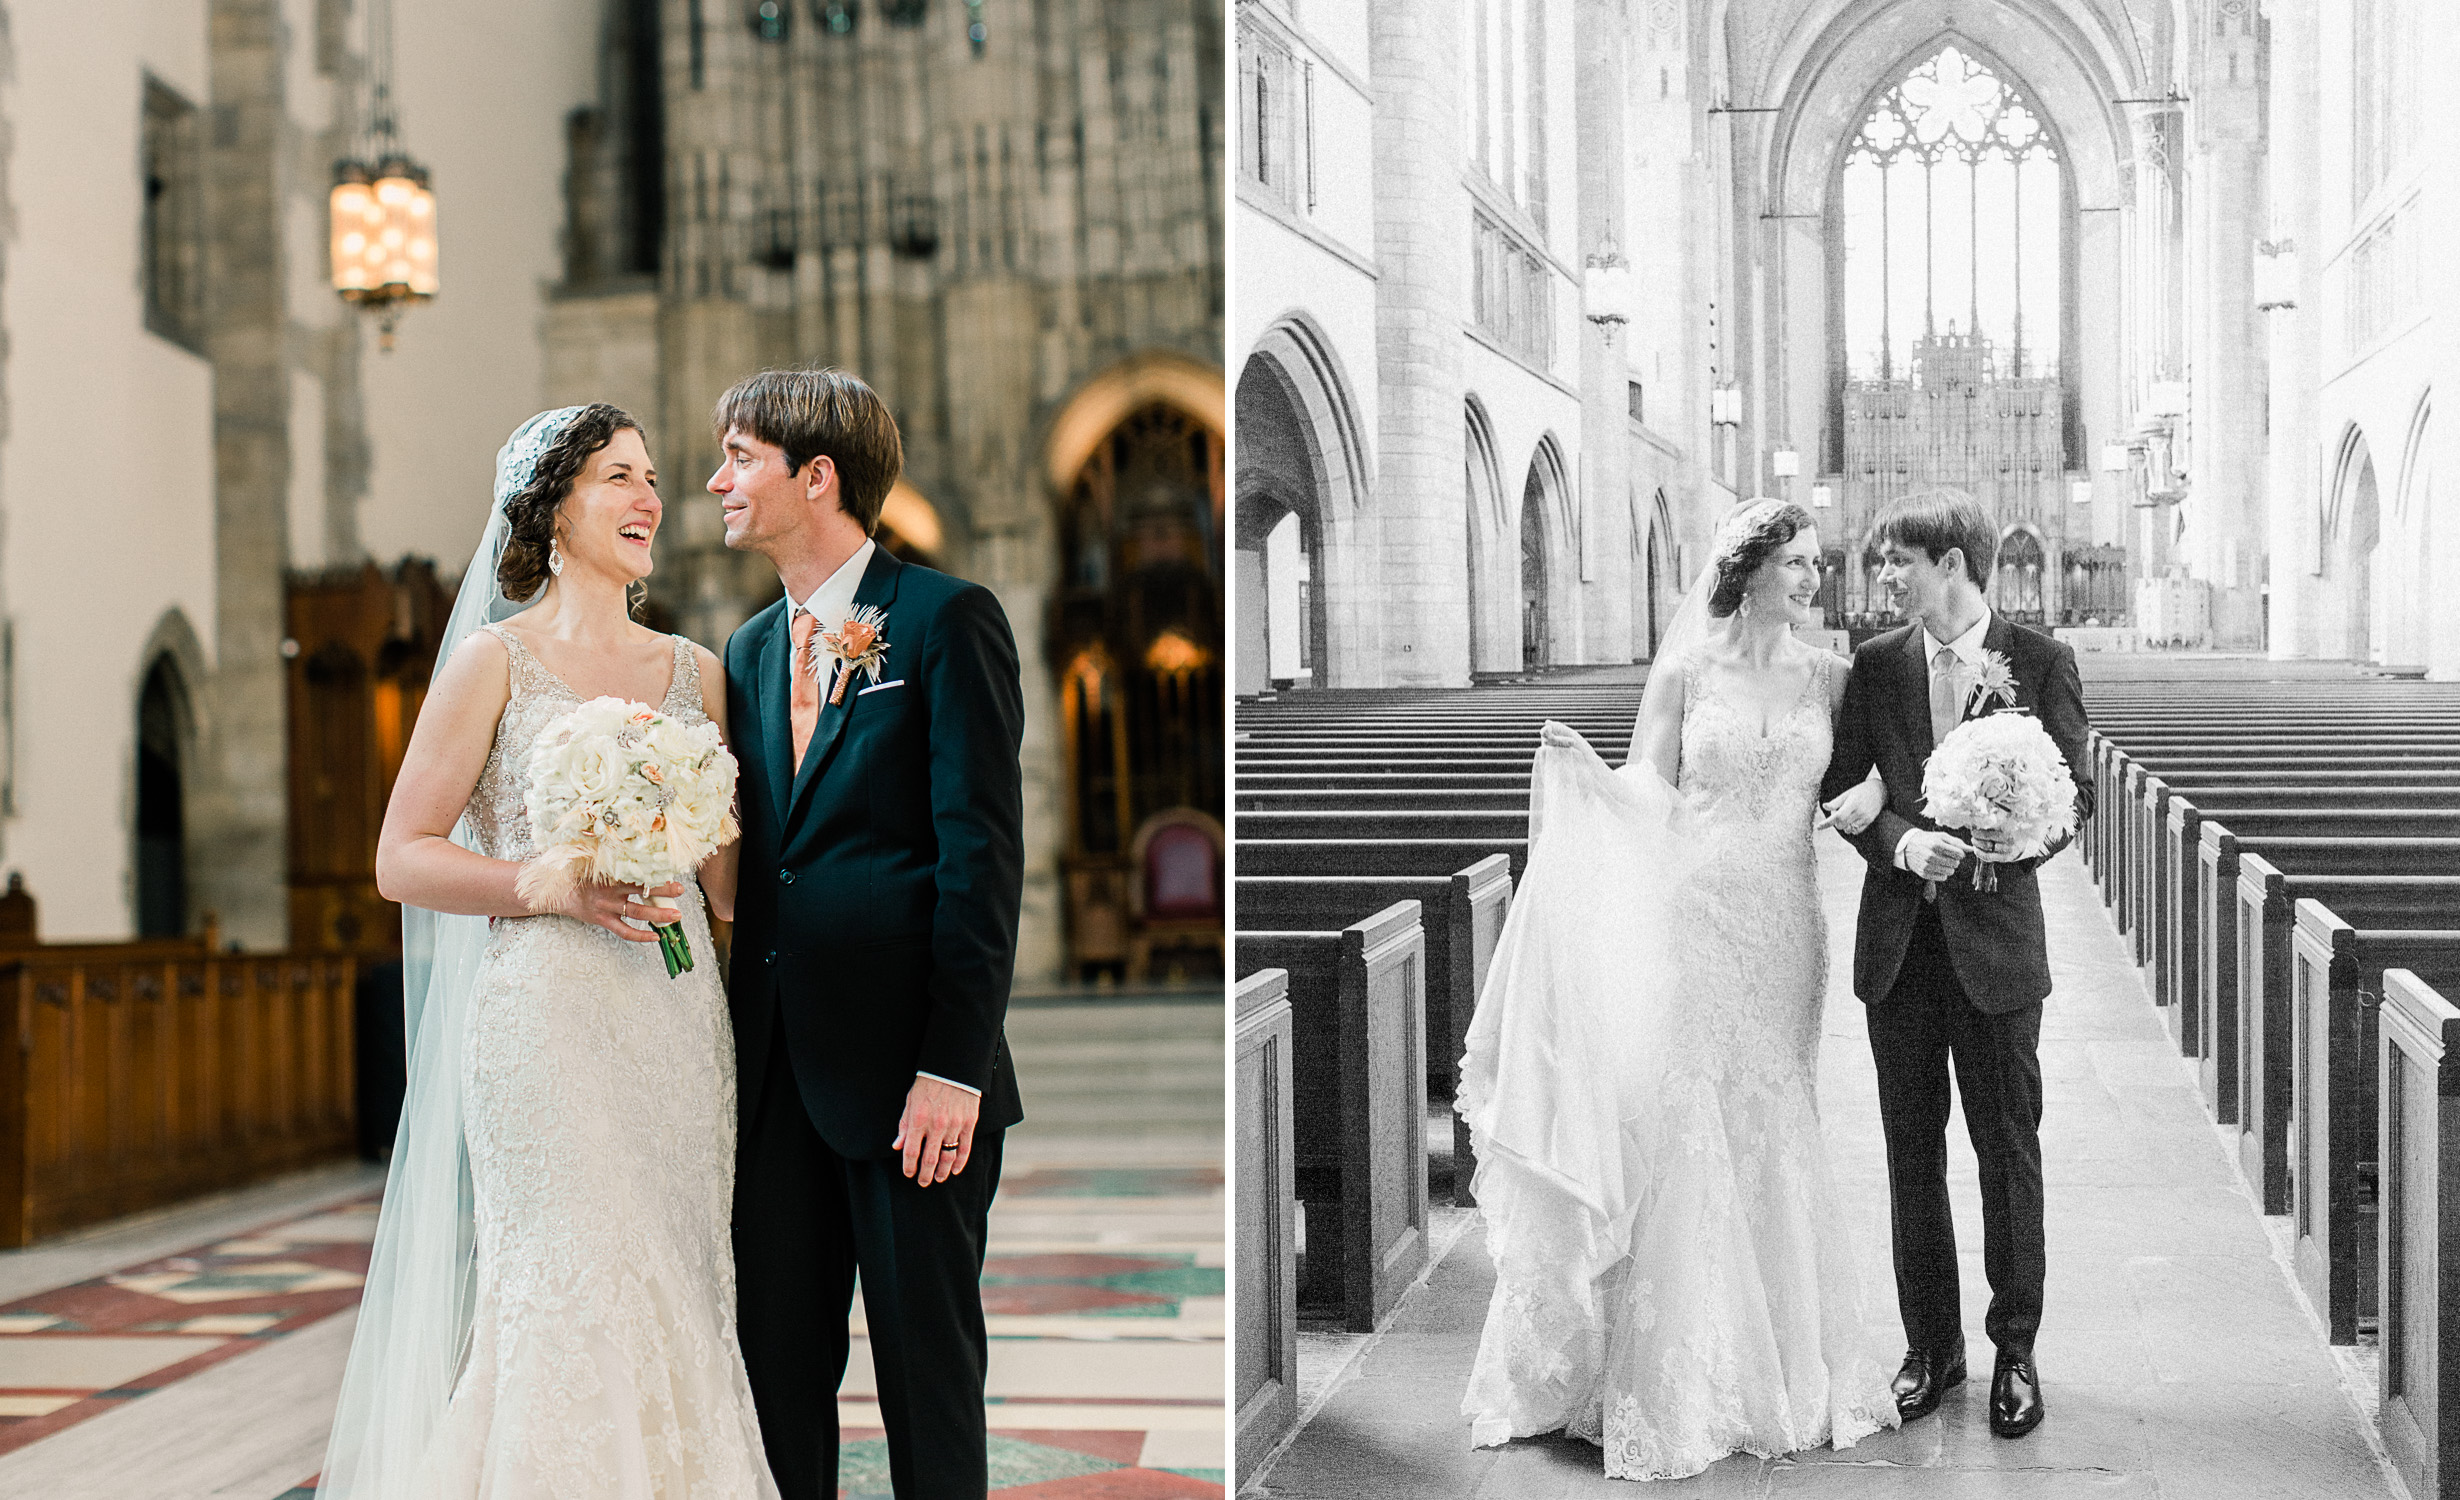 Dorothy_Louise_Photography_University_of_Chicago_Wedding11.jpg